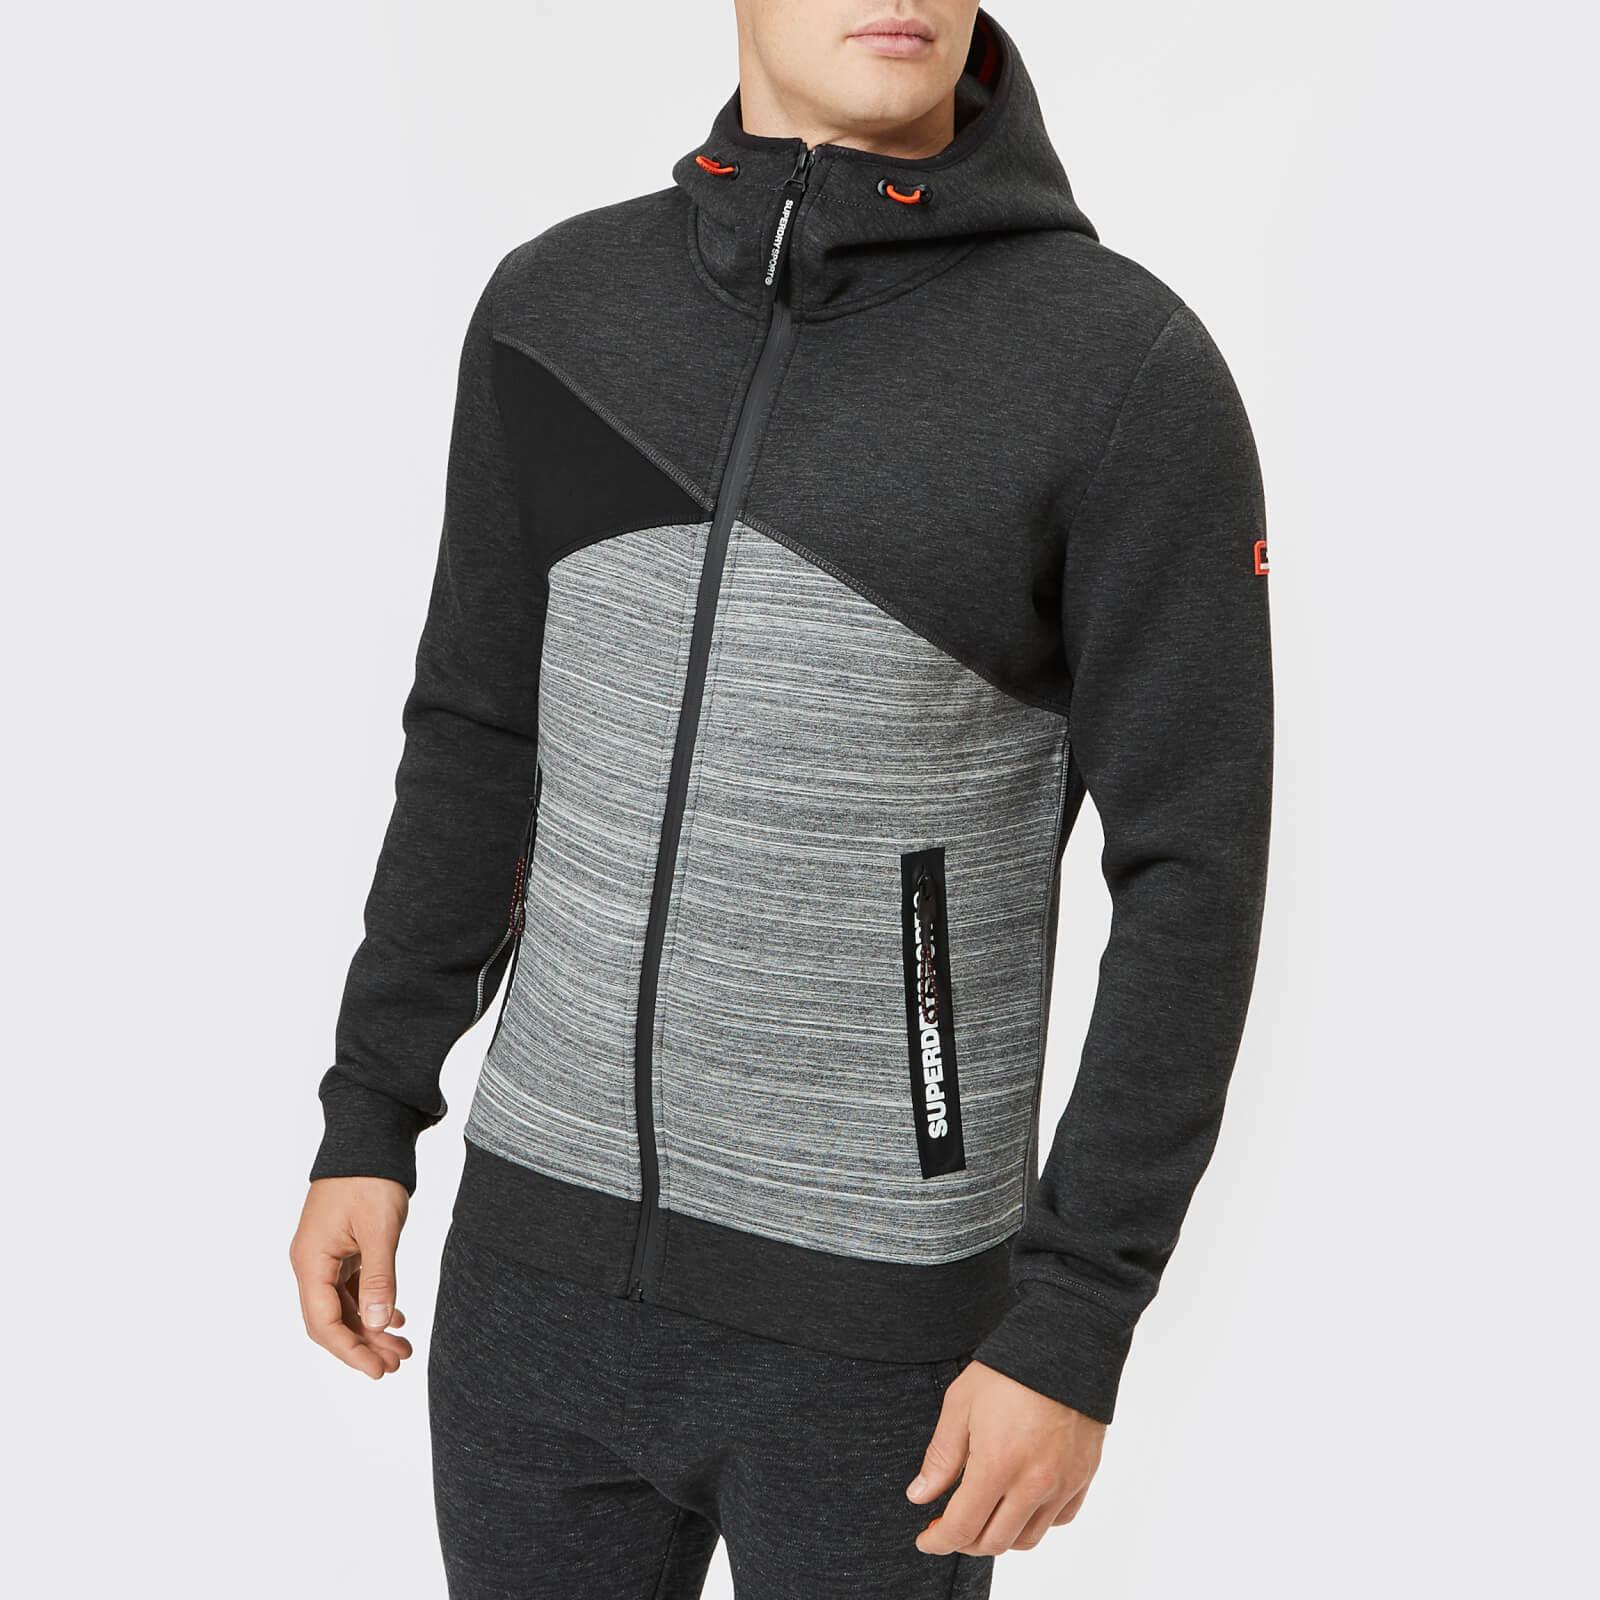 0d4272002c5 Superdry Sport Men's Gym Tech Spliced Zip Hoodie - Carbon/Black Mens  Clothing | TheHut.com